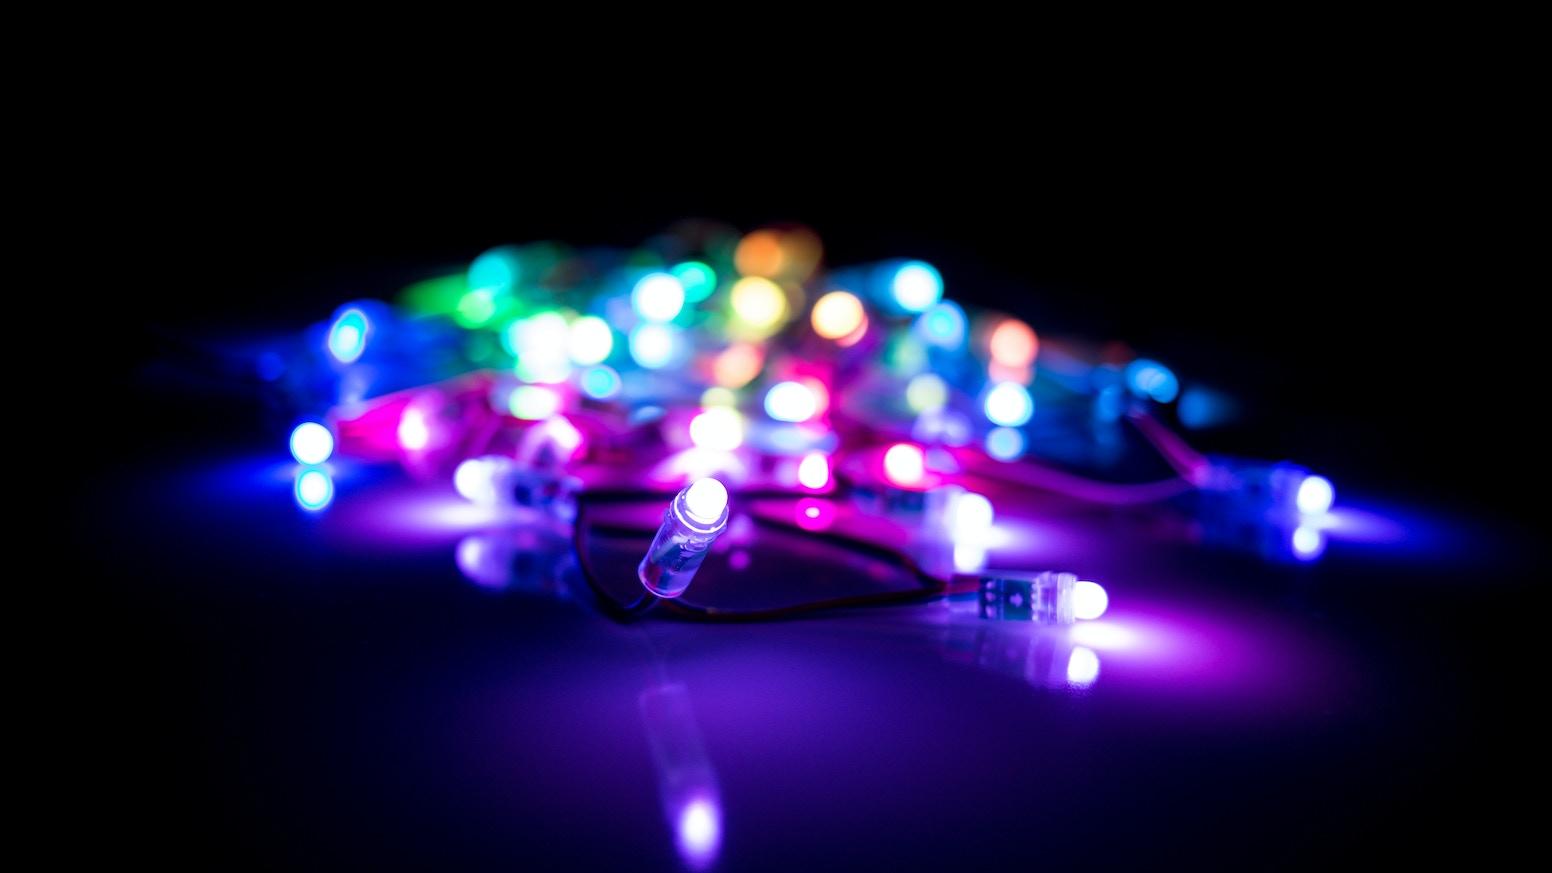 HypnoLights, Full Color Animated String Lights! by Hypnocube Kickstarter